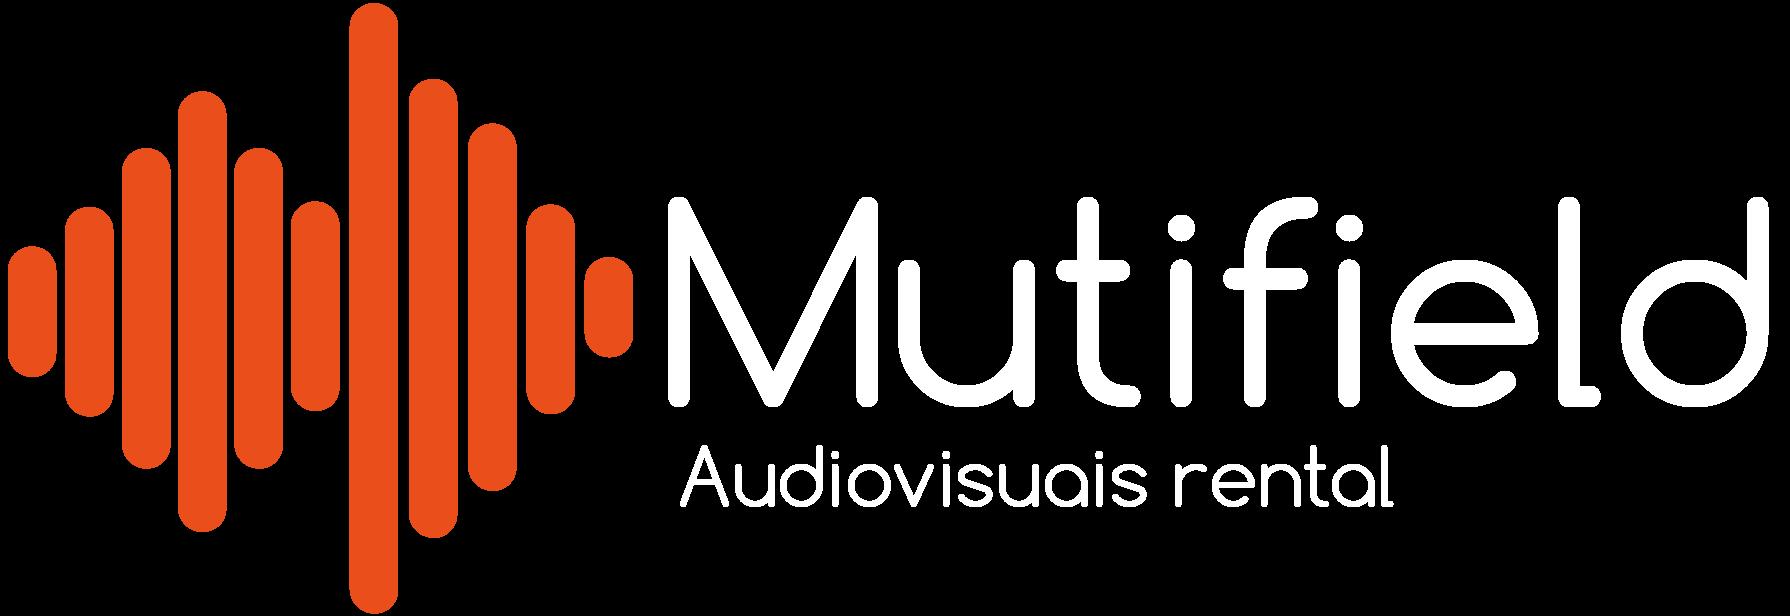 Mutifield Audiovisuais